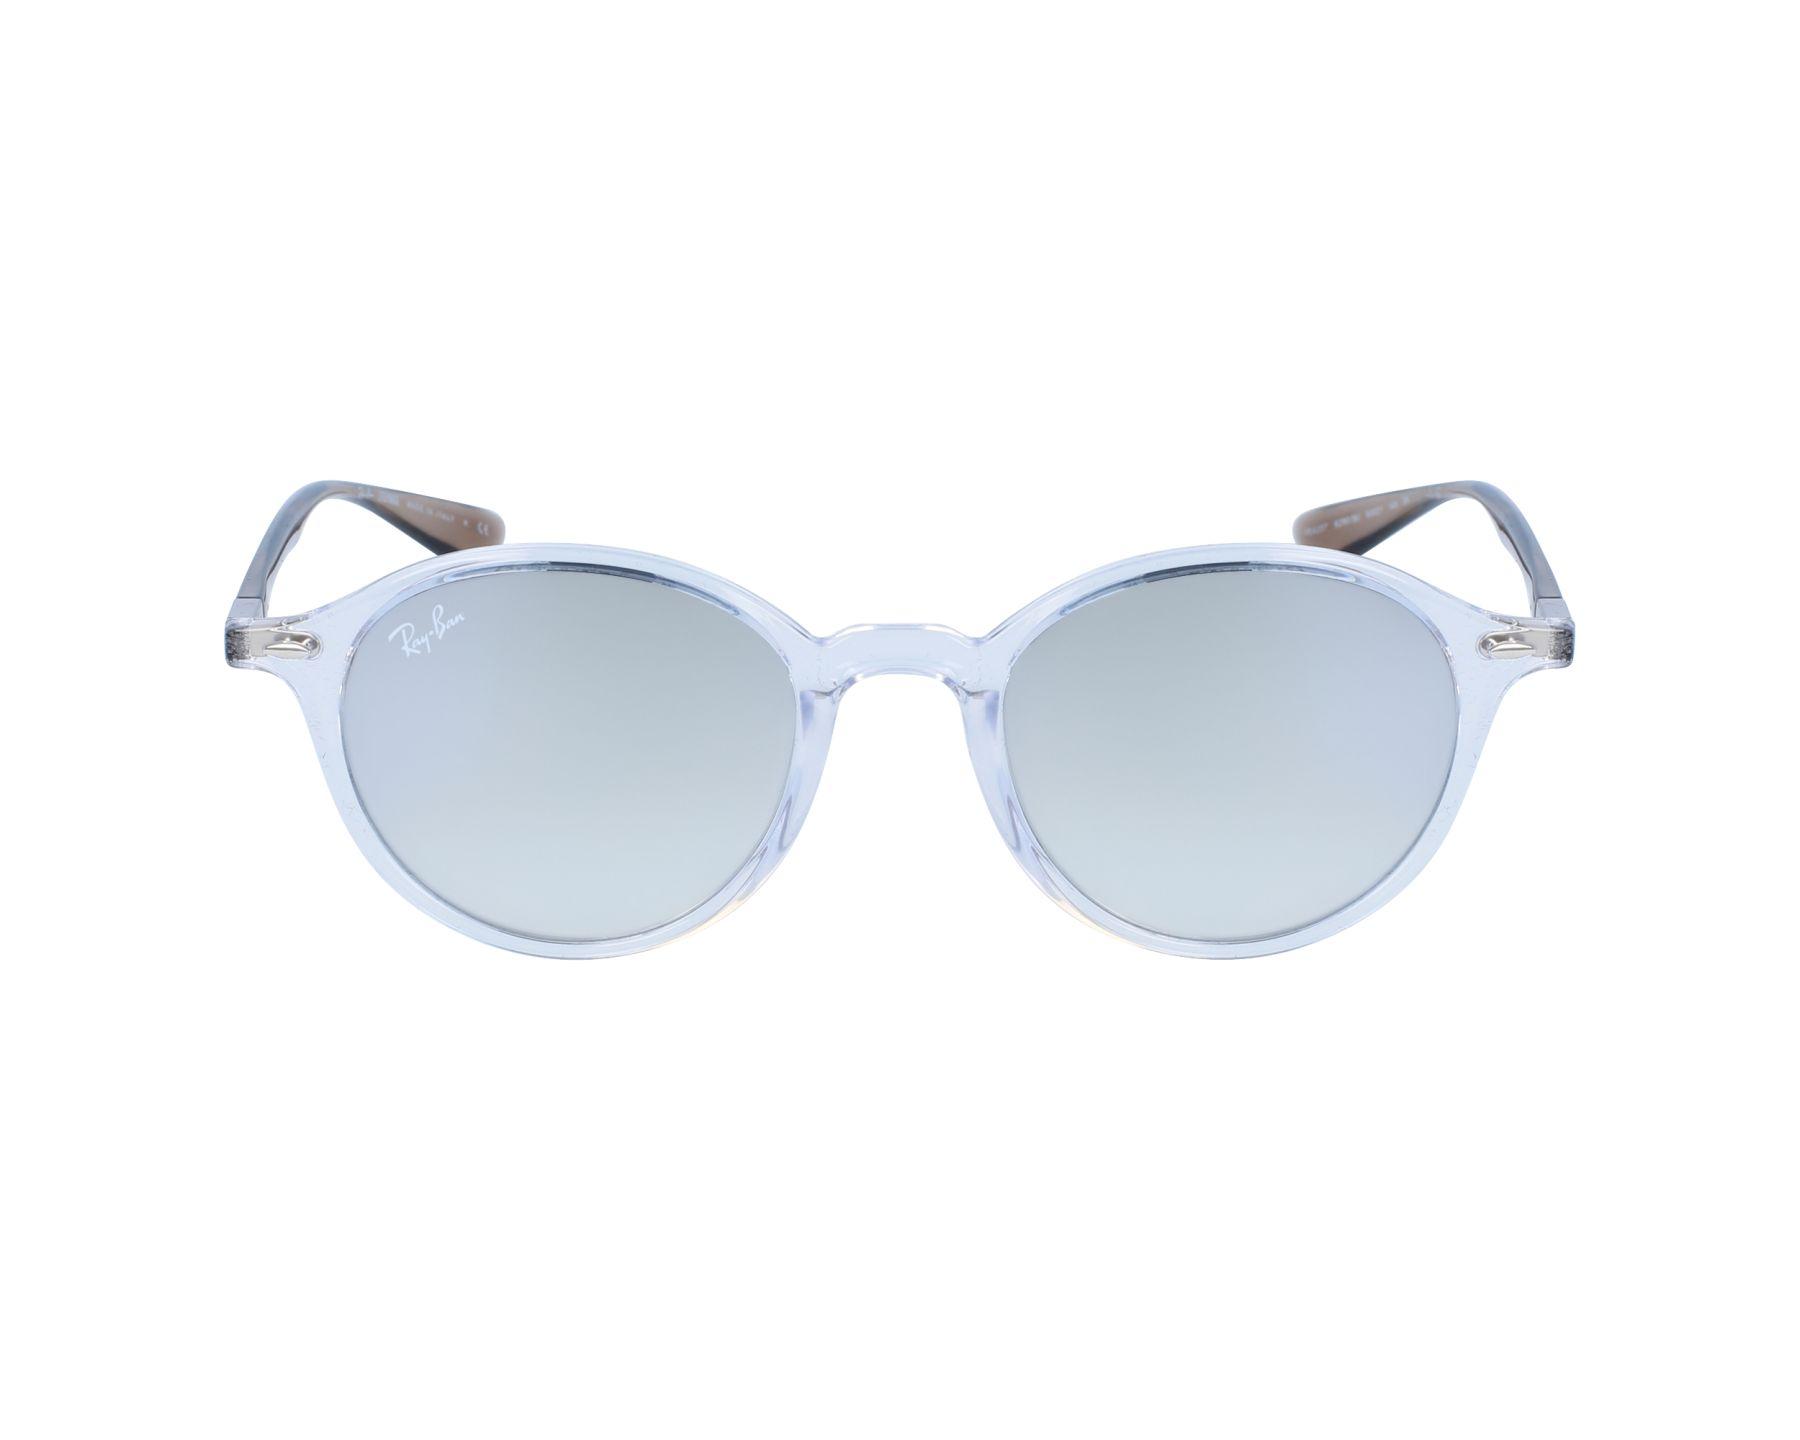 463ac4efeef4fd Sunglasses Ray-Ban RB-4237 62909U 50-21 White Grey profile view